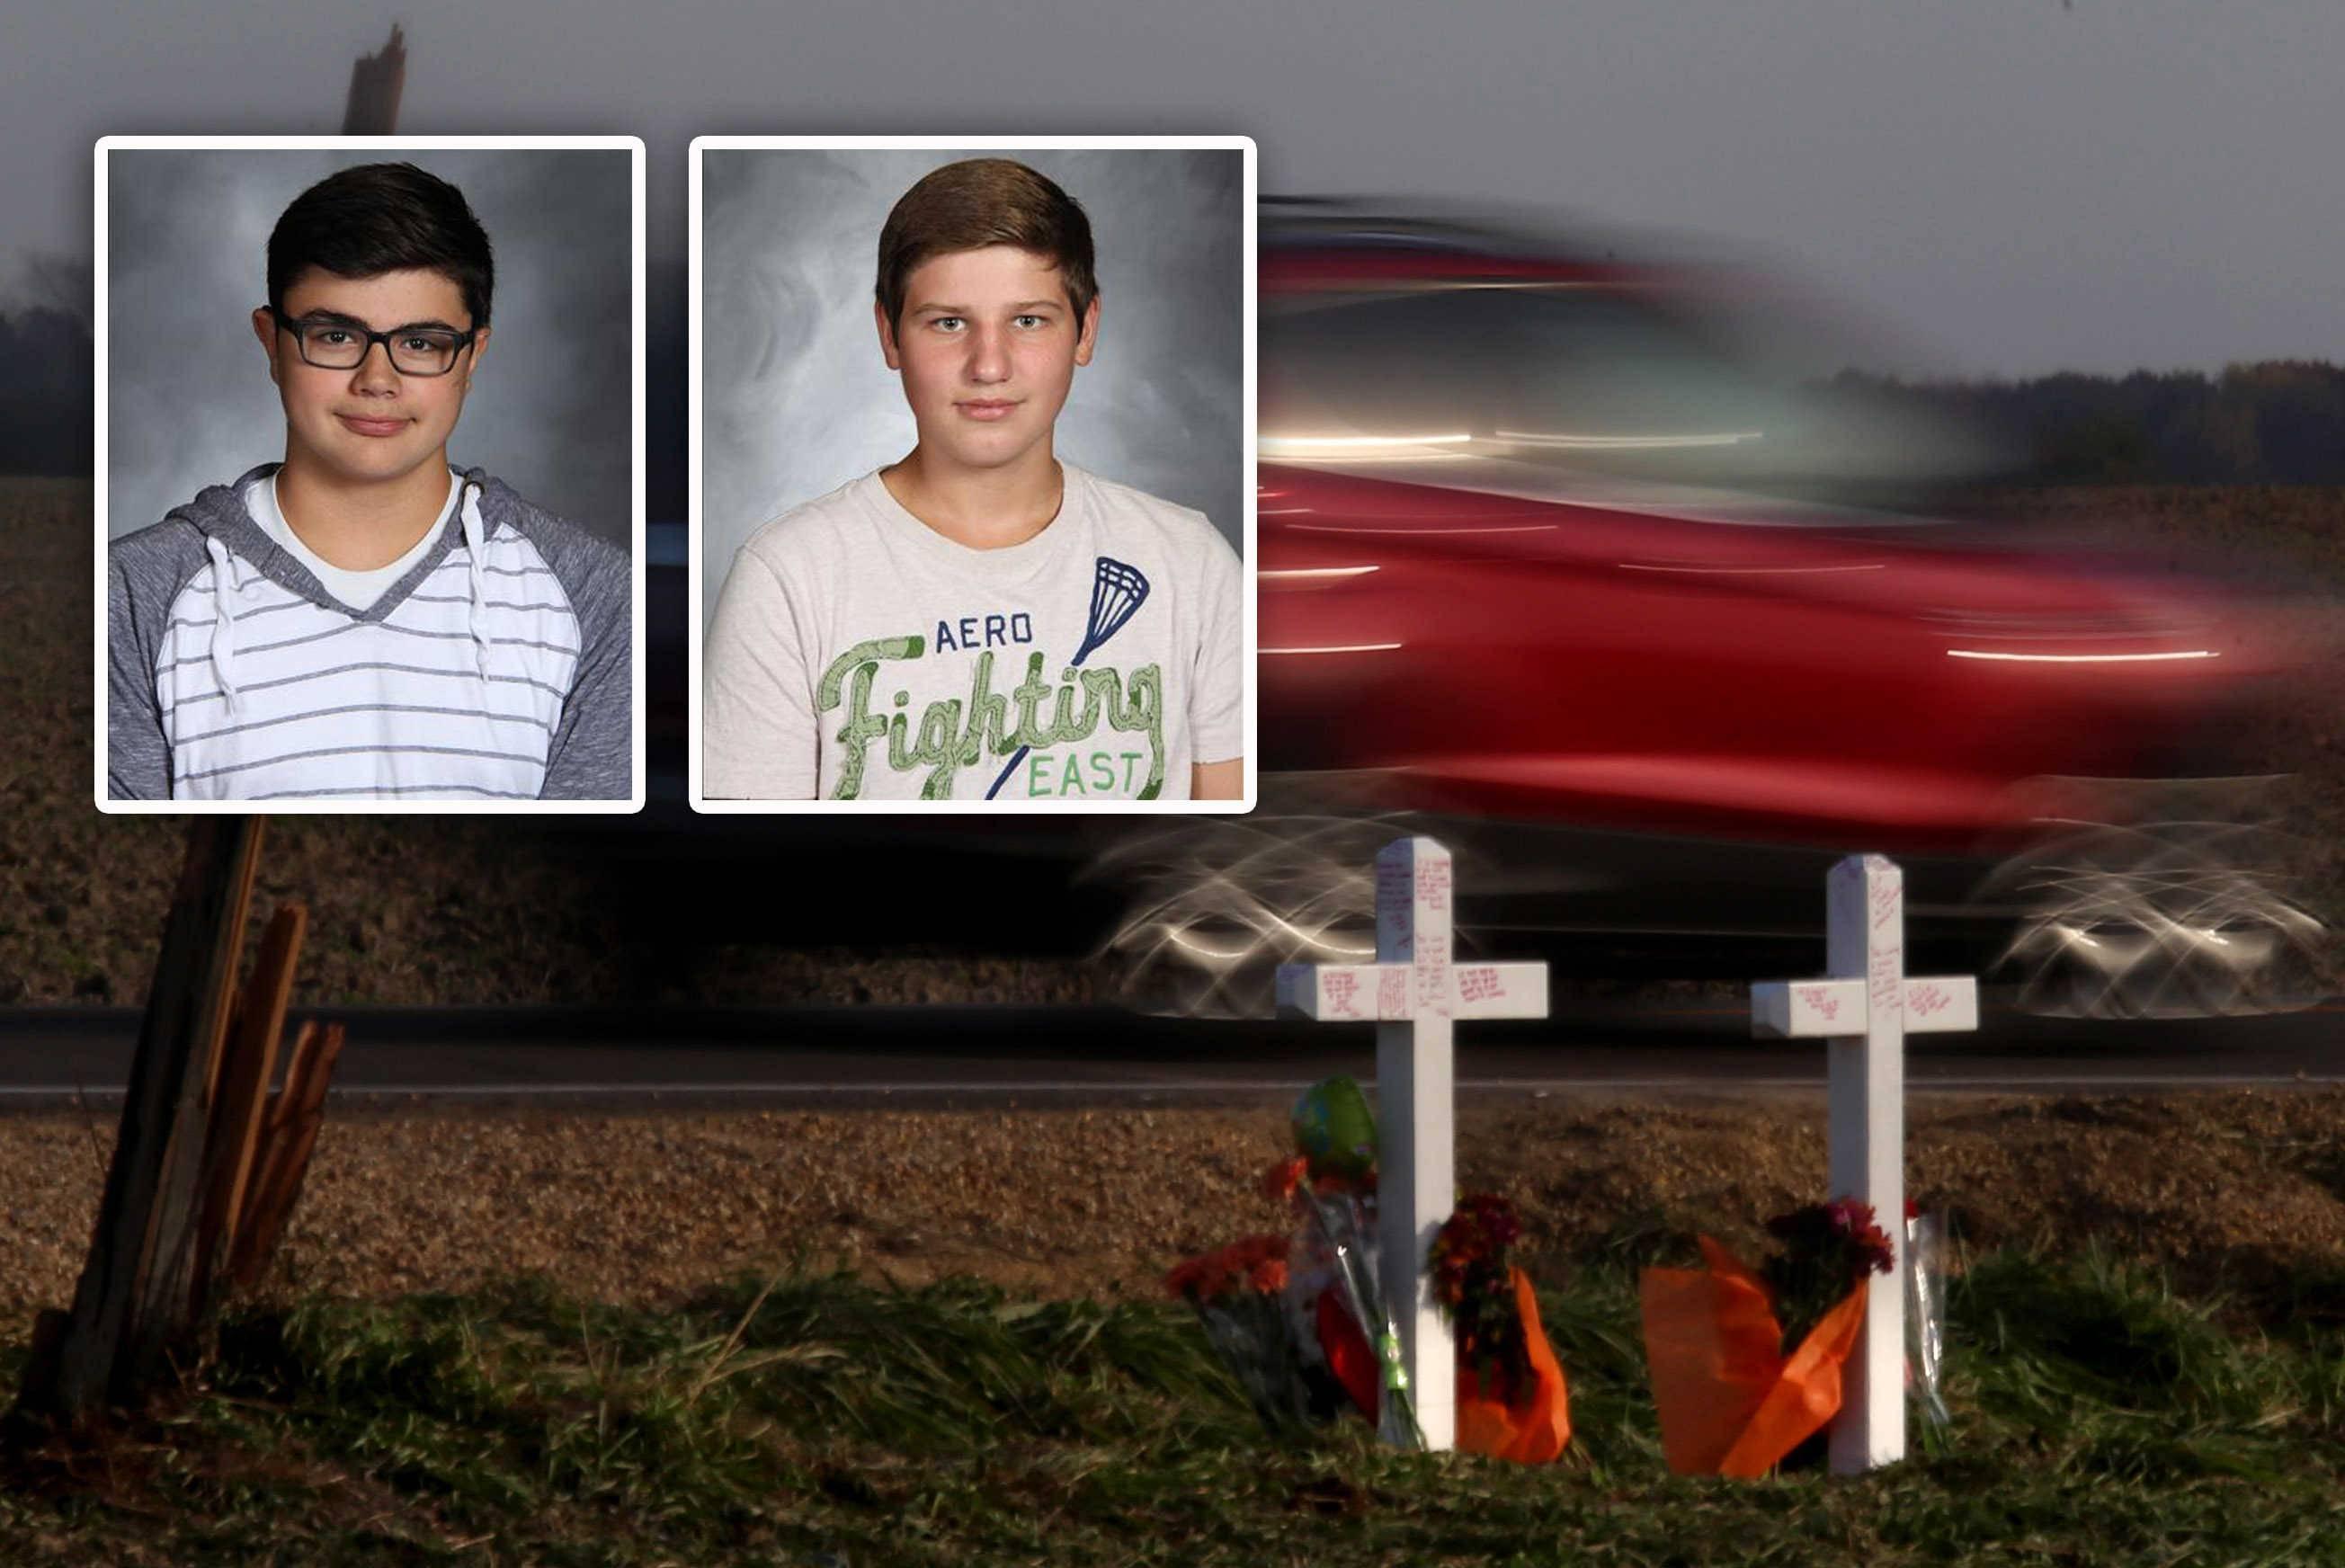 Arthur kill road teen death images